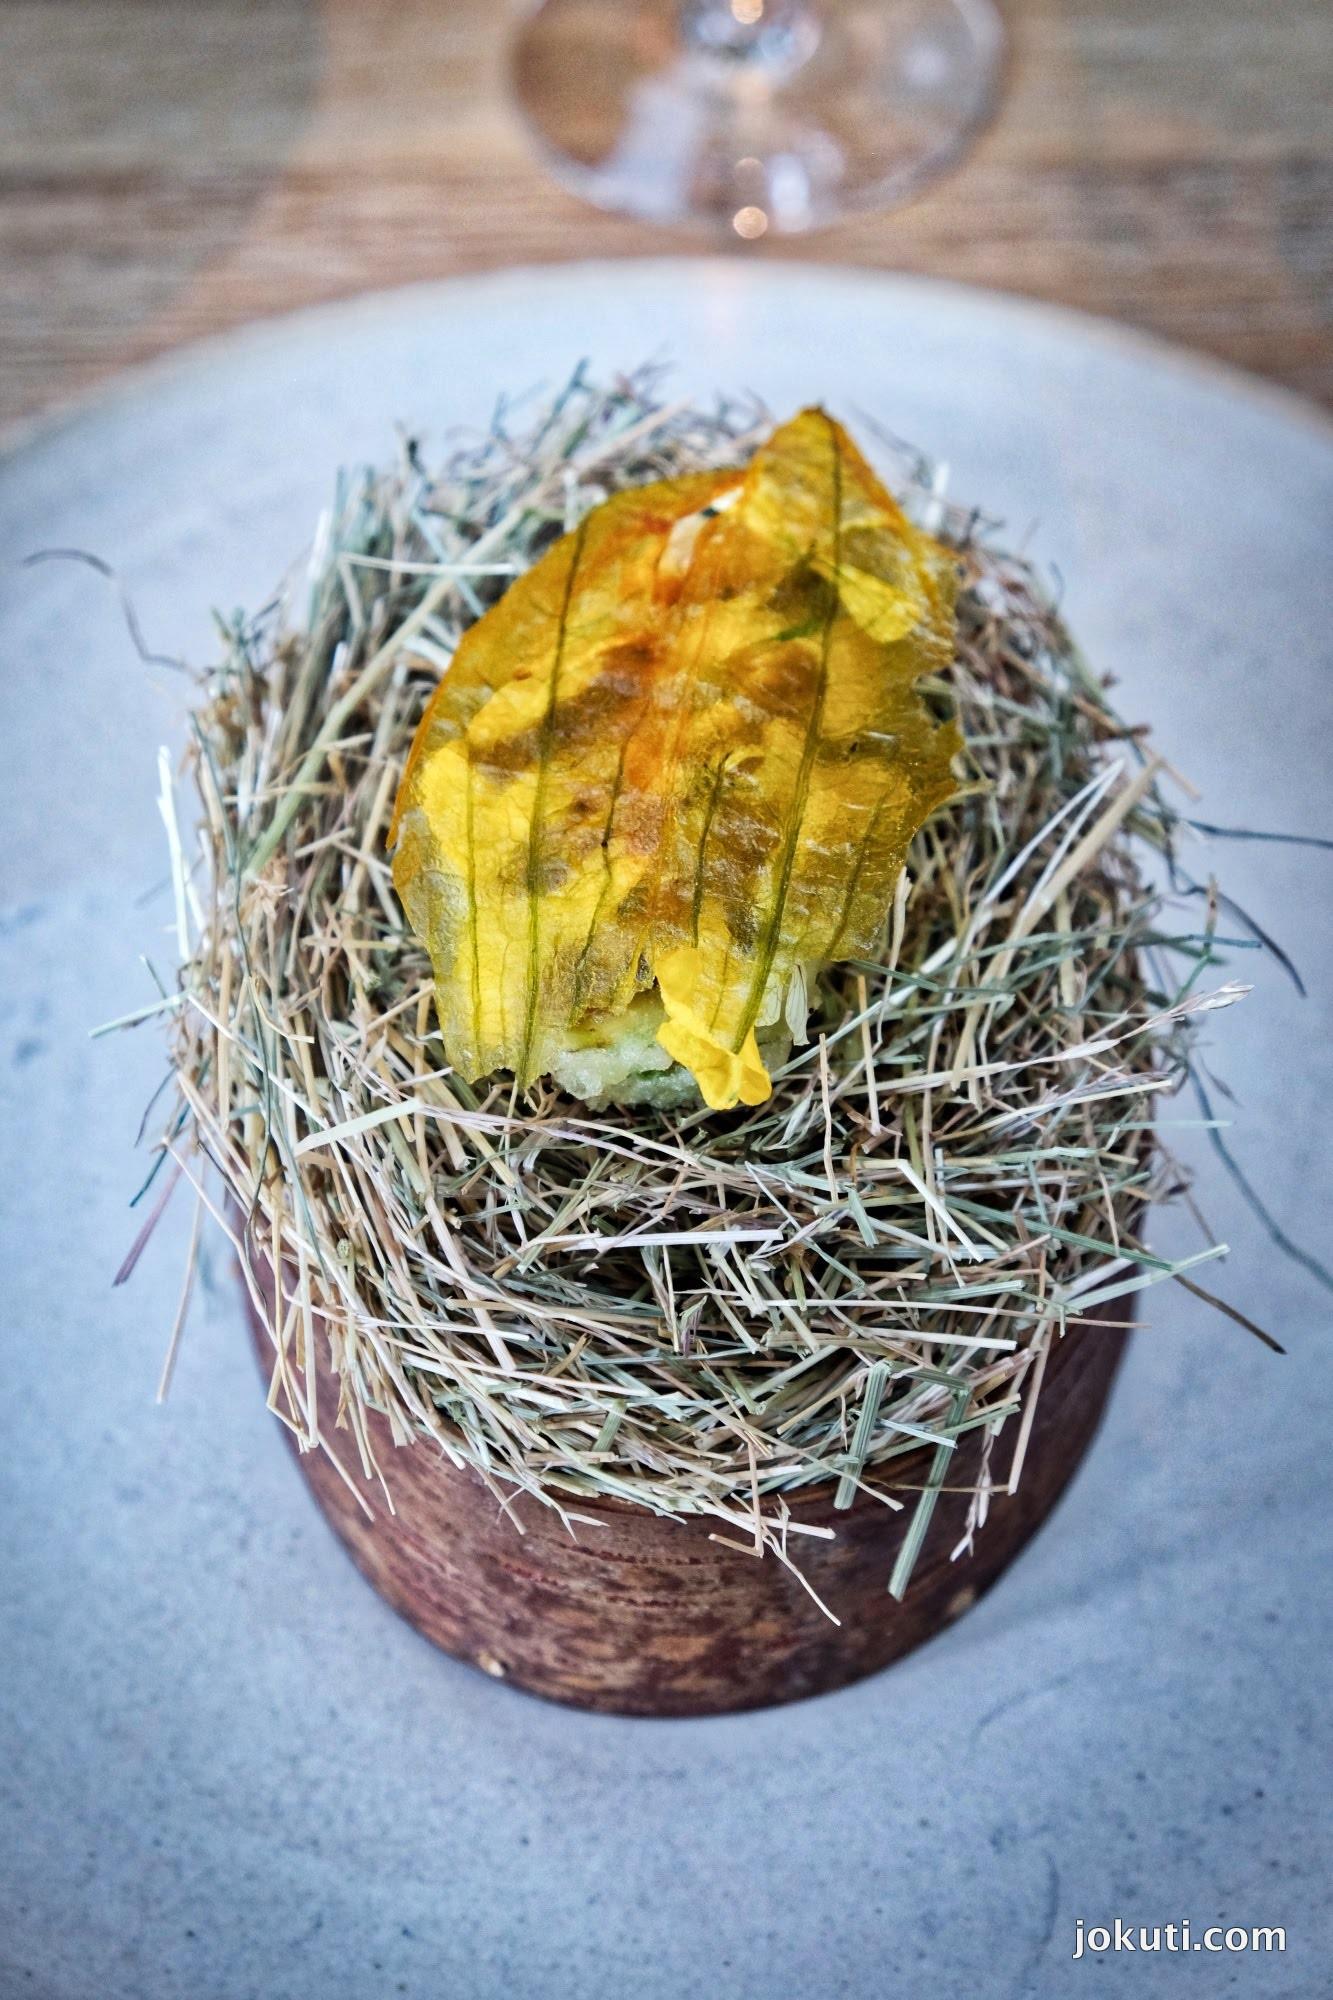 dscf6606_noma_copenhagen_vegeterian_plant_restaurant_redzepi_jokuti_vilagevo_l.jpg